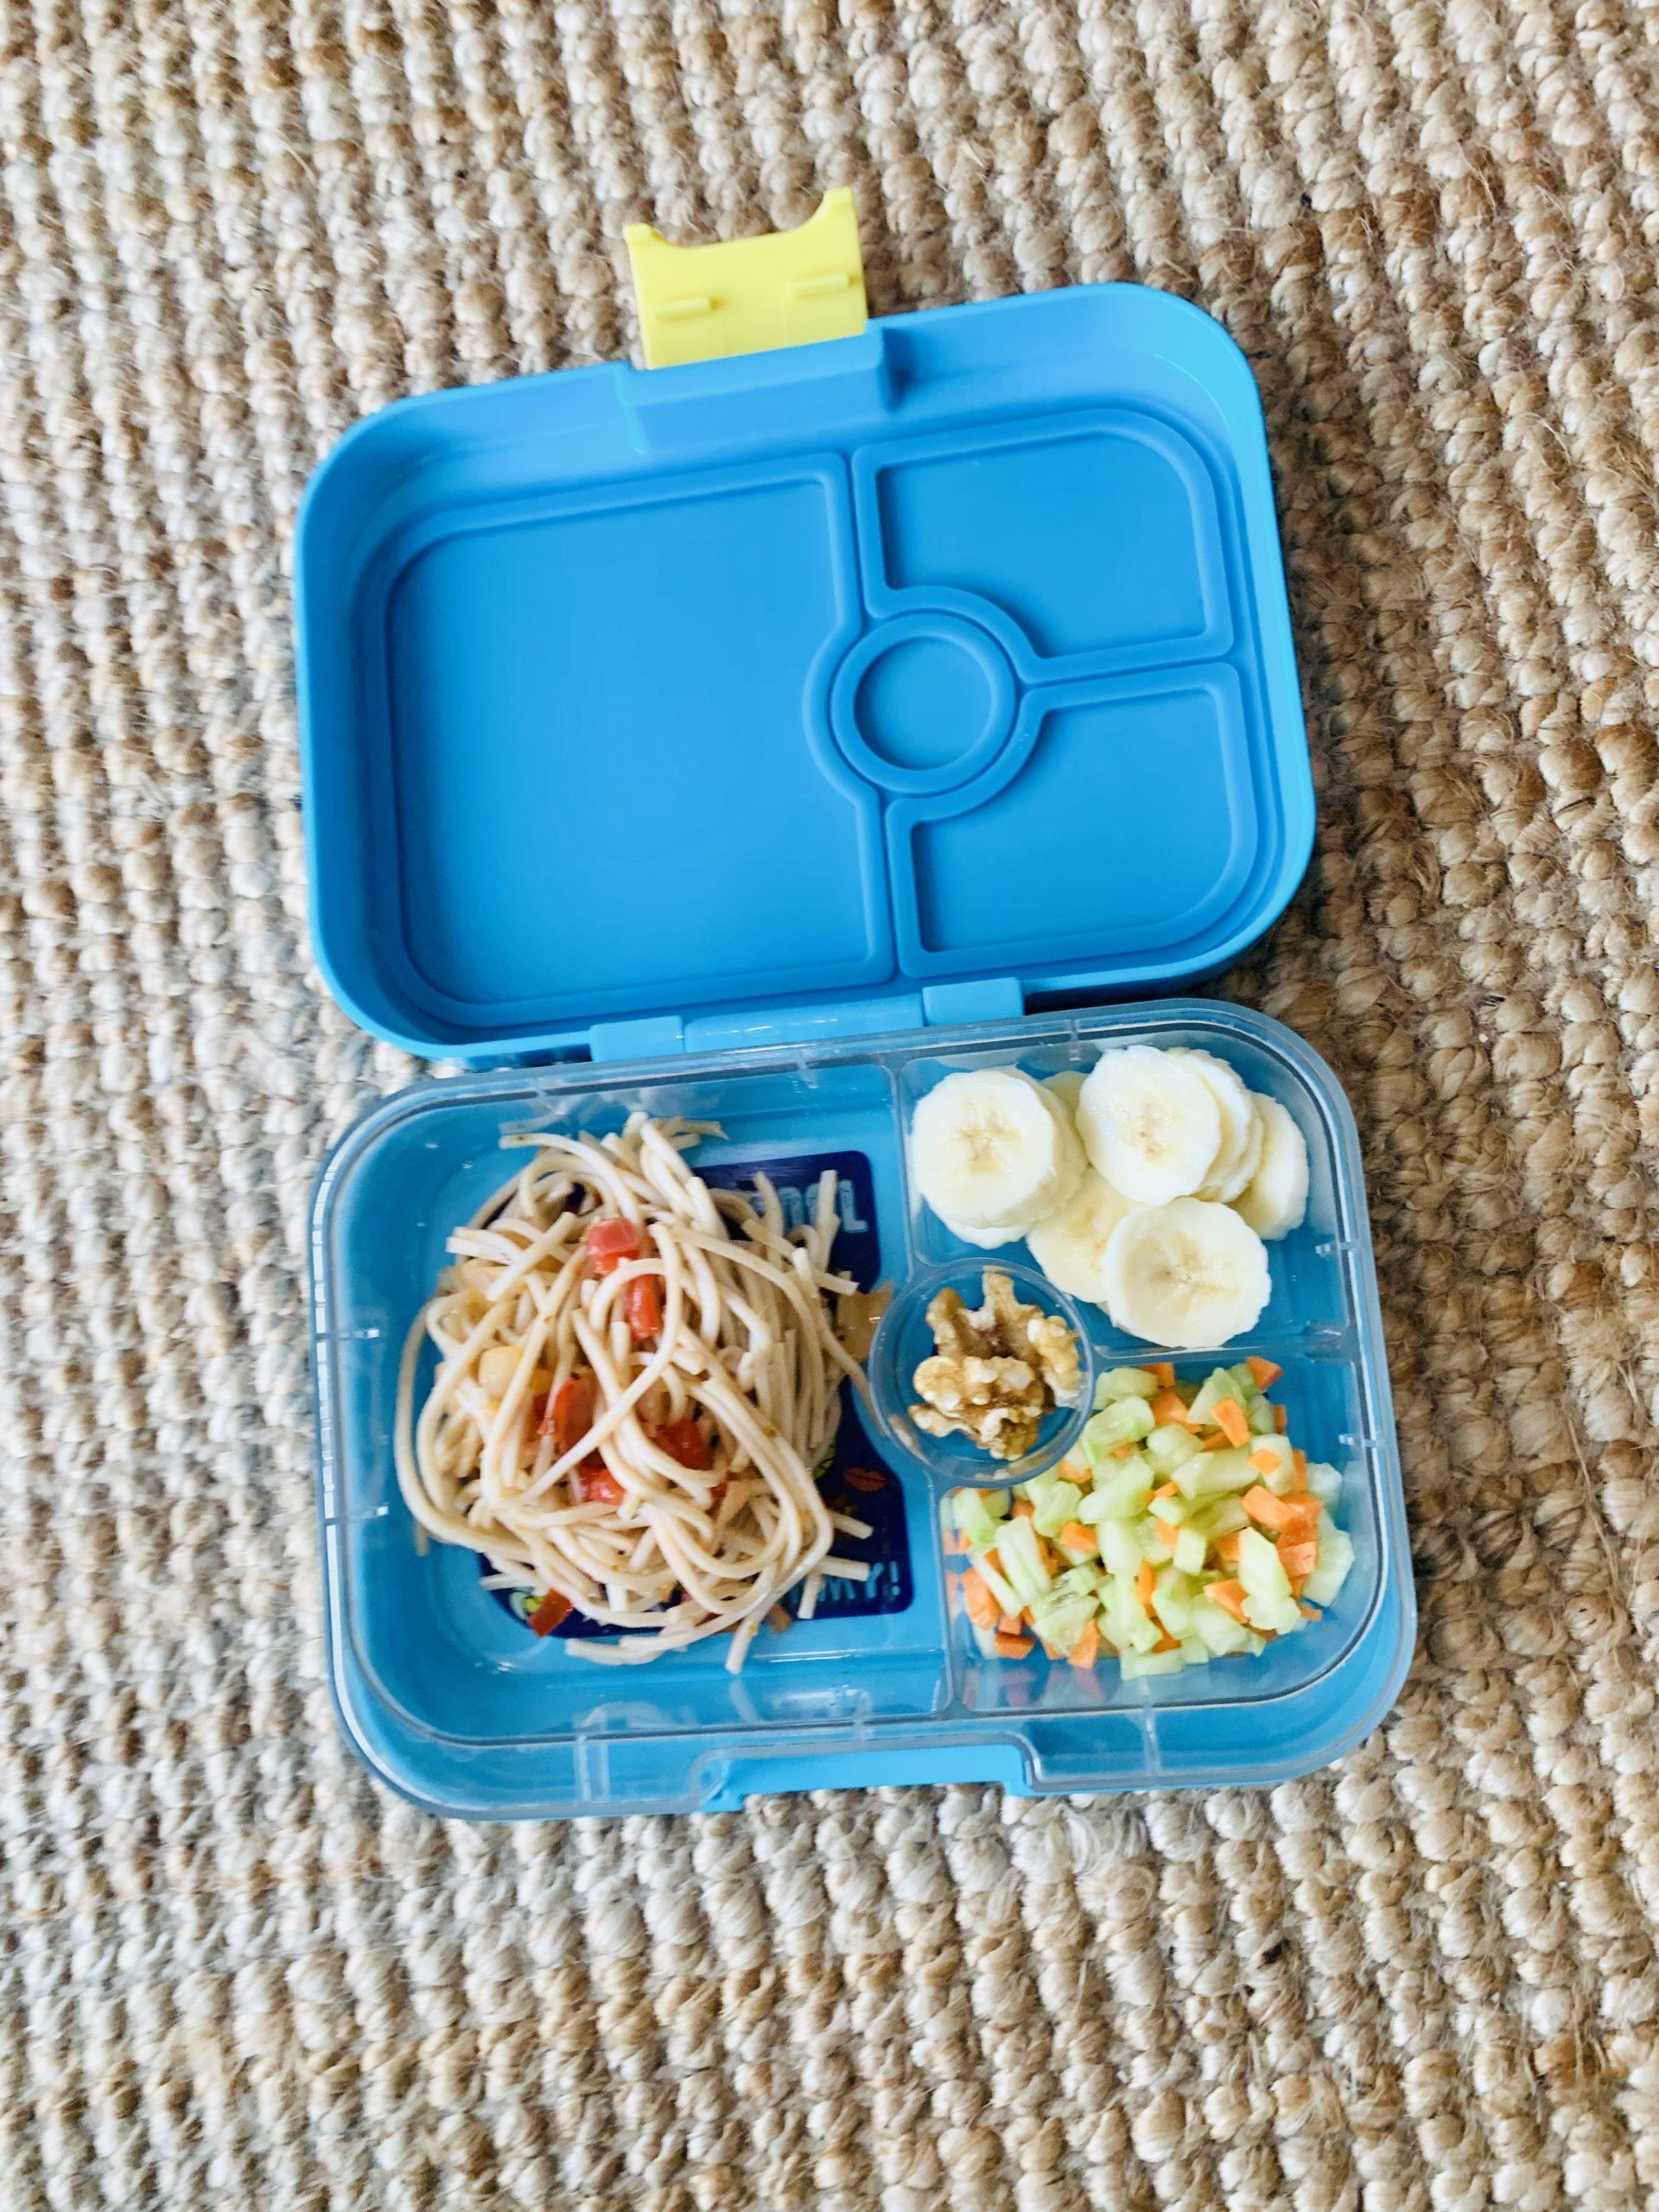 lunch box ideas - Pasta